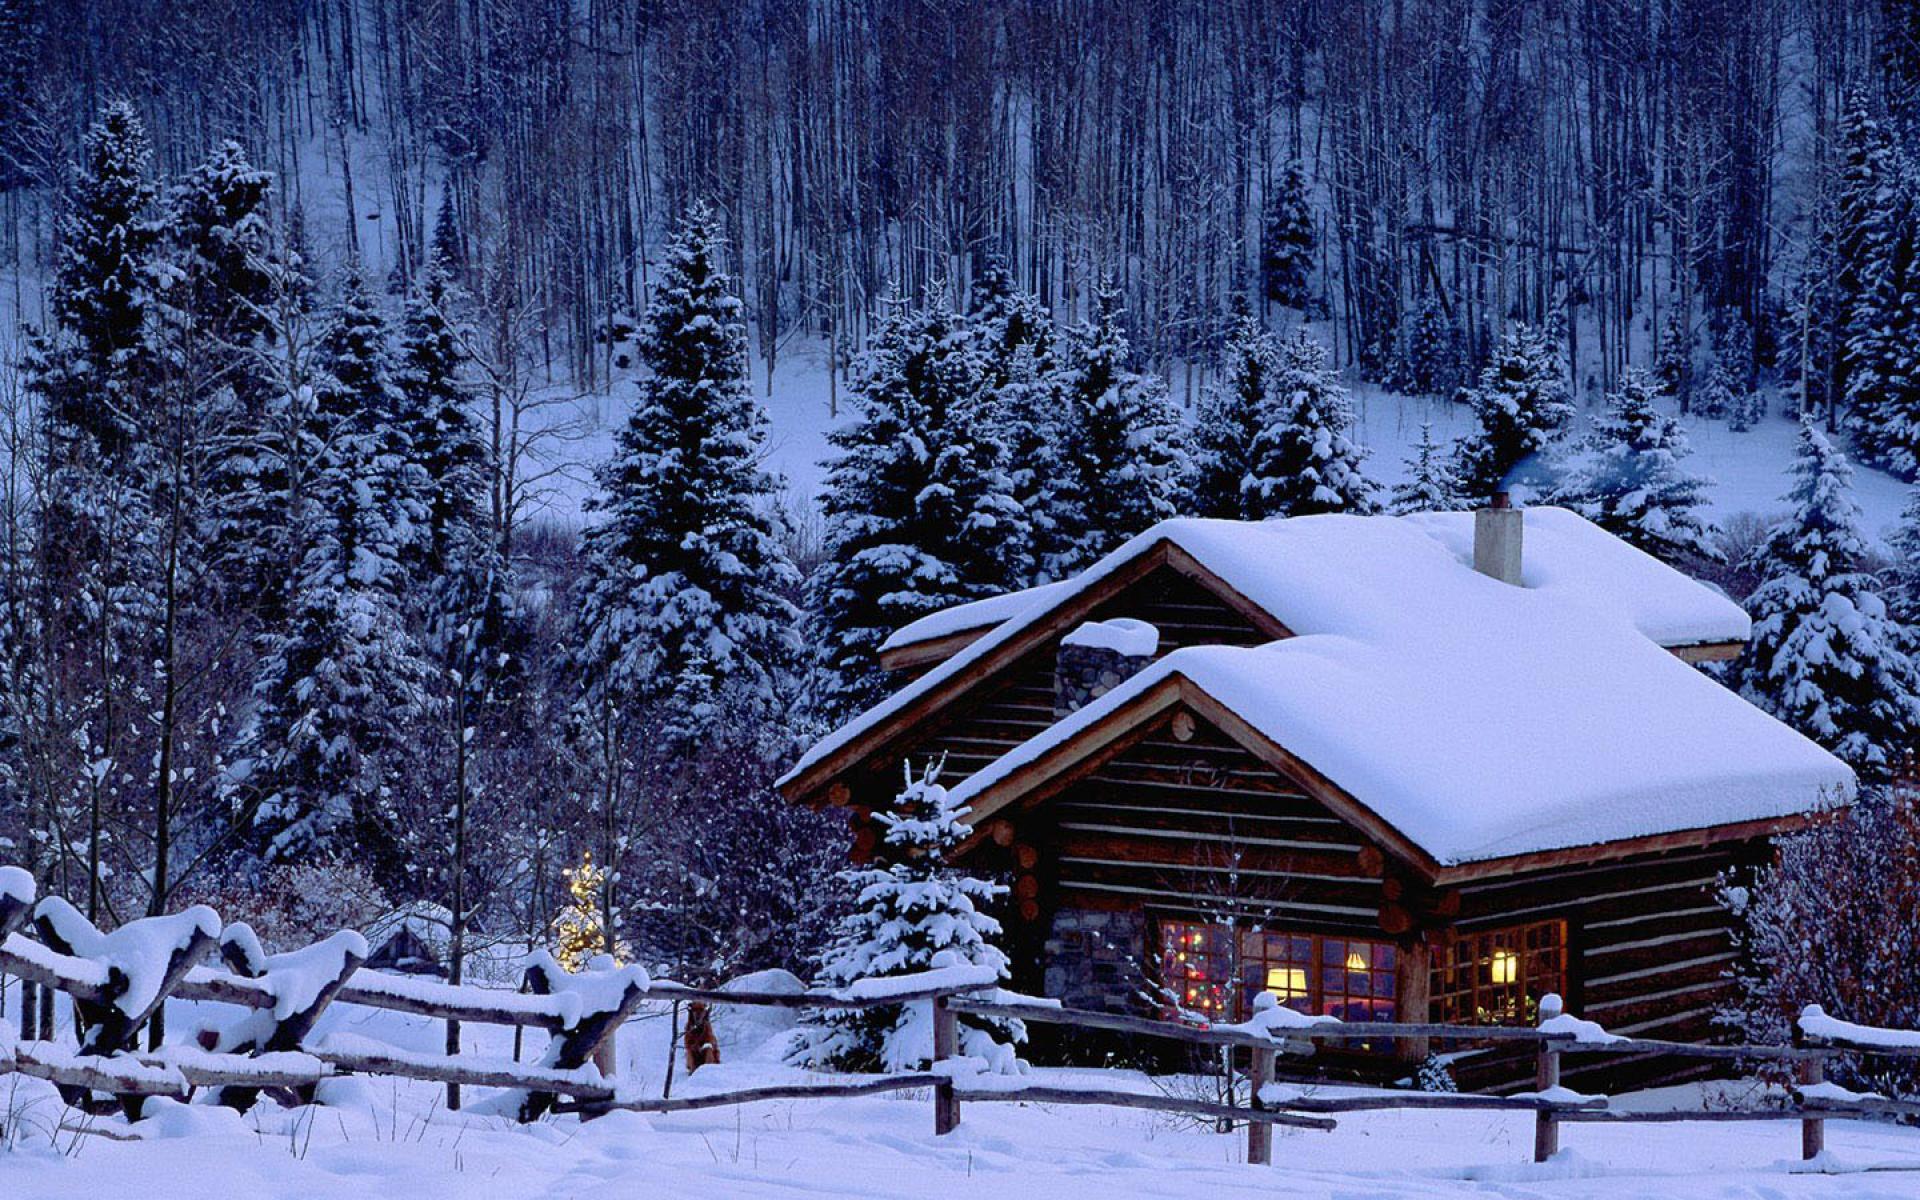 dreamy scene snow wallpaper scenery warmly house 1920x1200